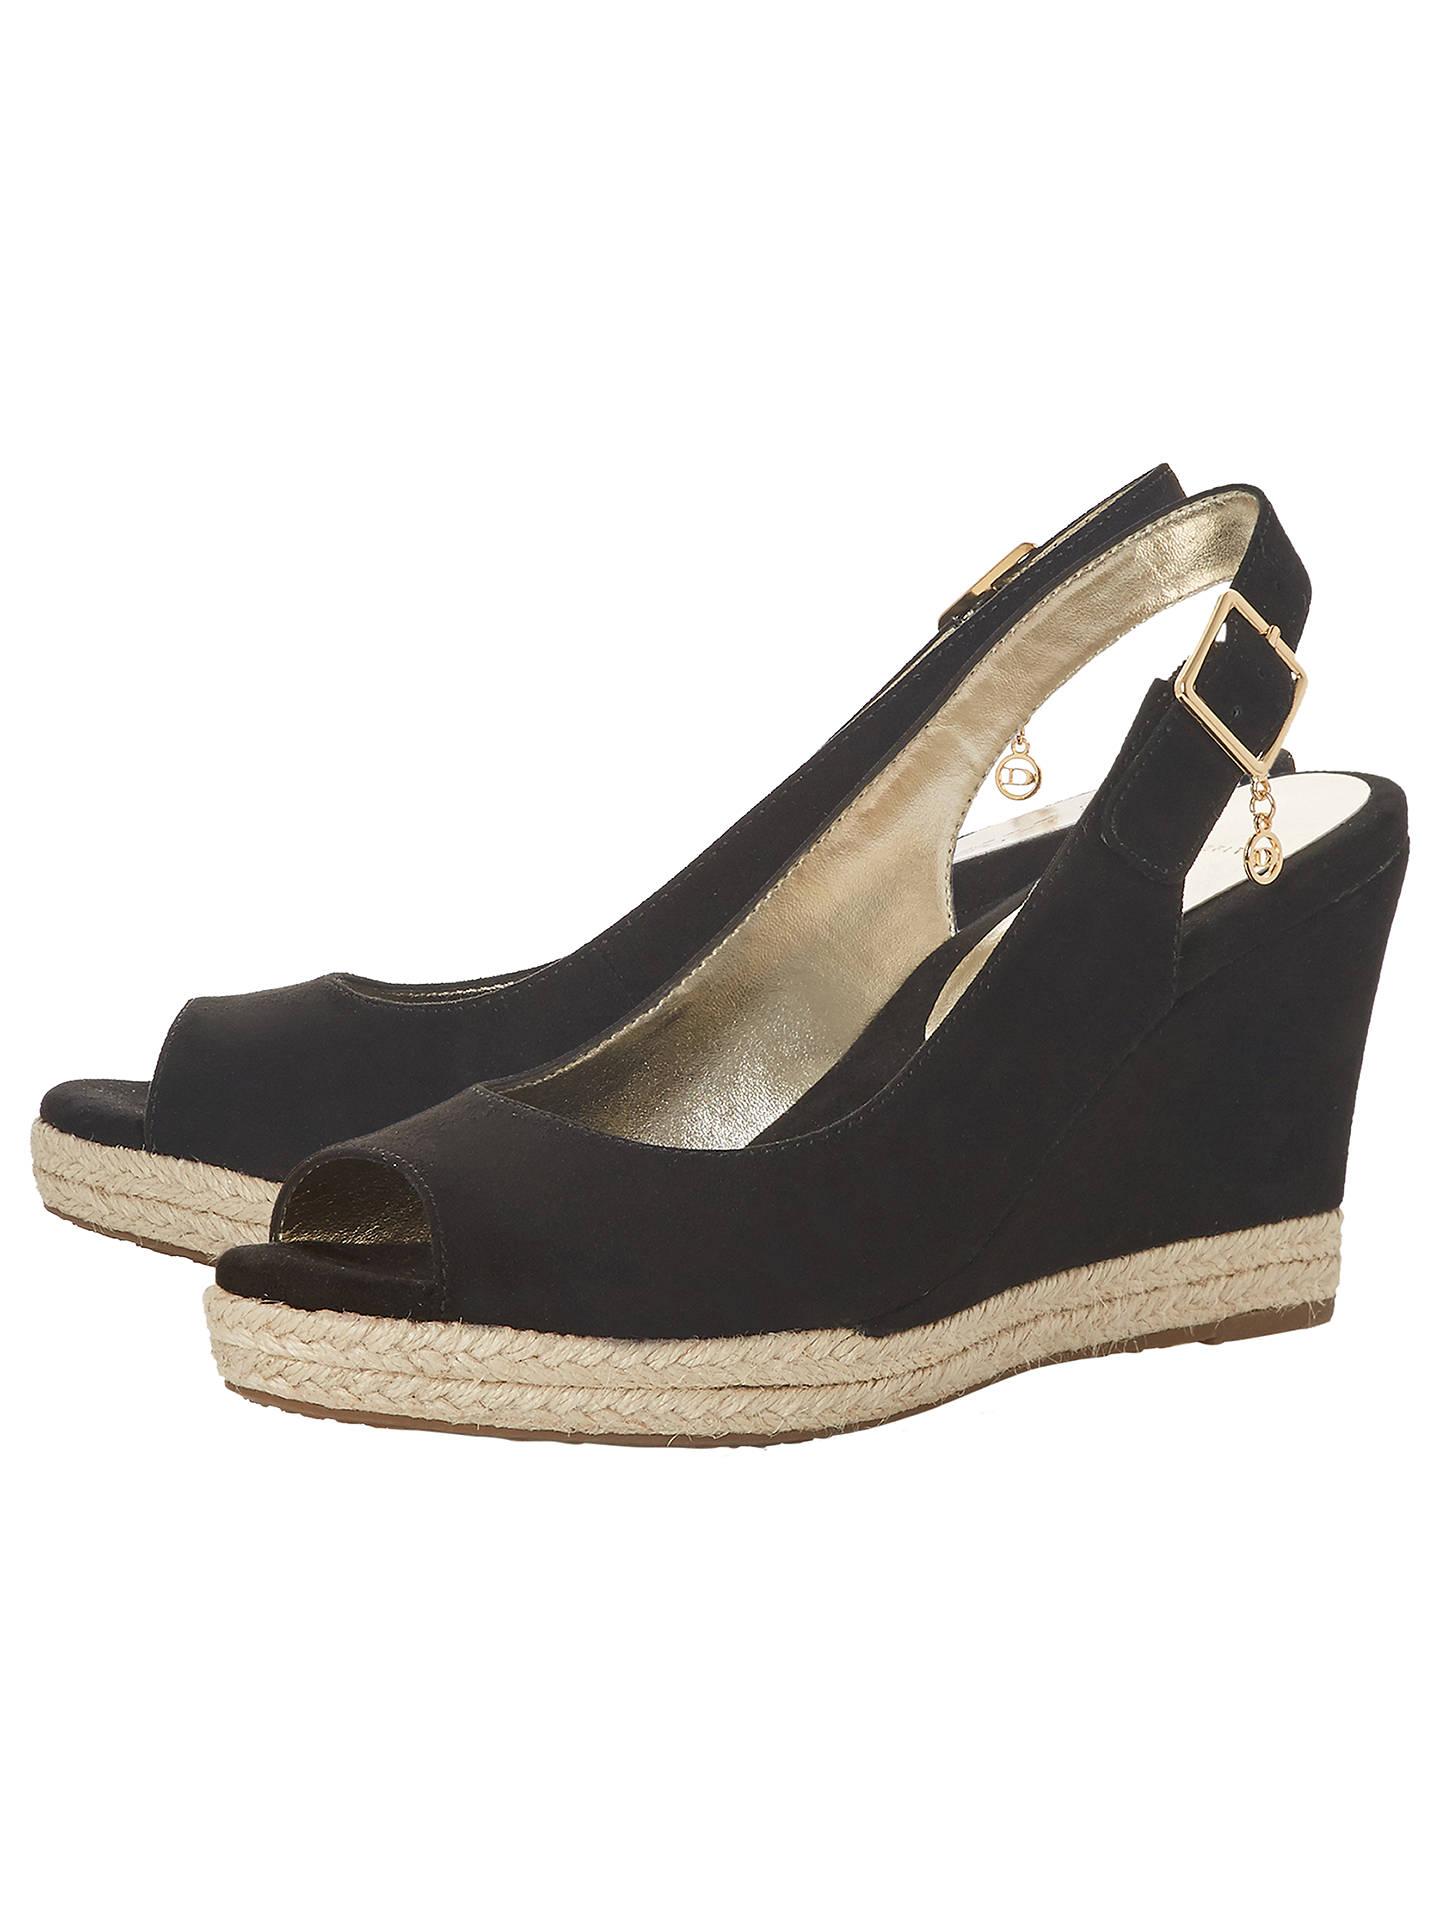 843252e115f Dune Wide Fit Klick Wedge Heel Sandals at John Lewis   Partners